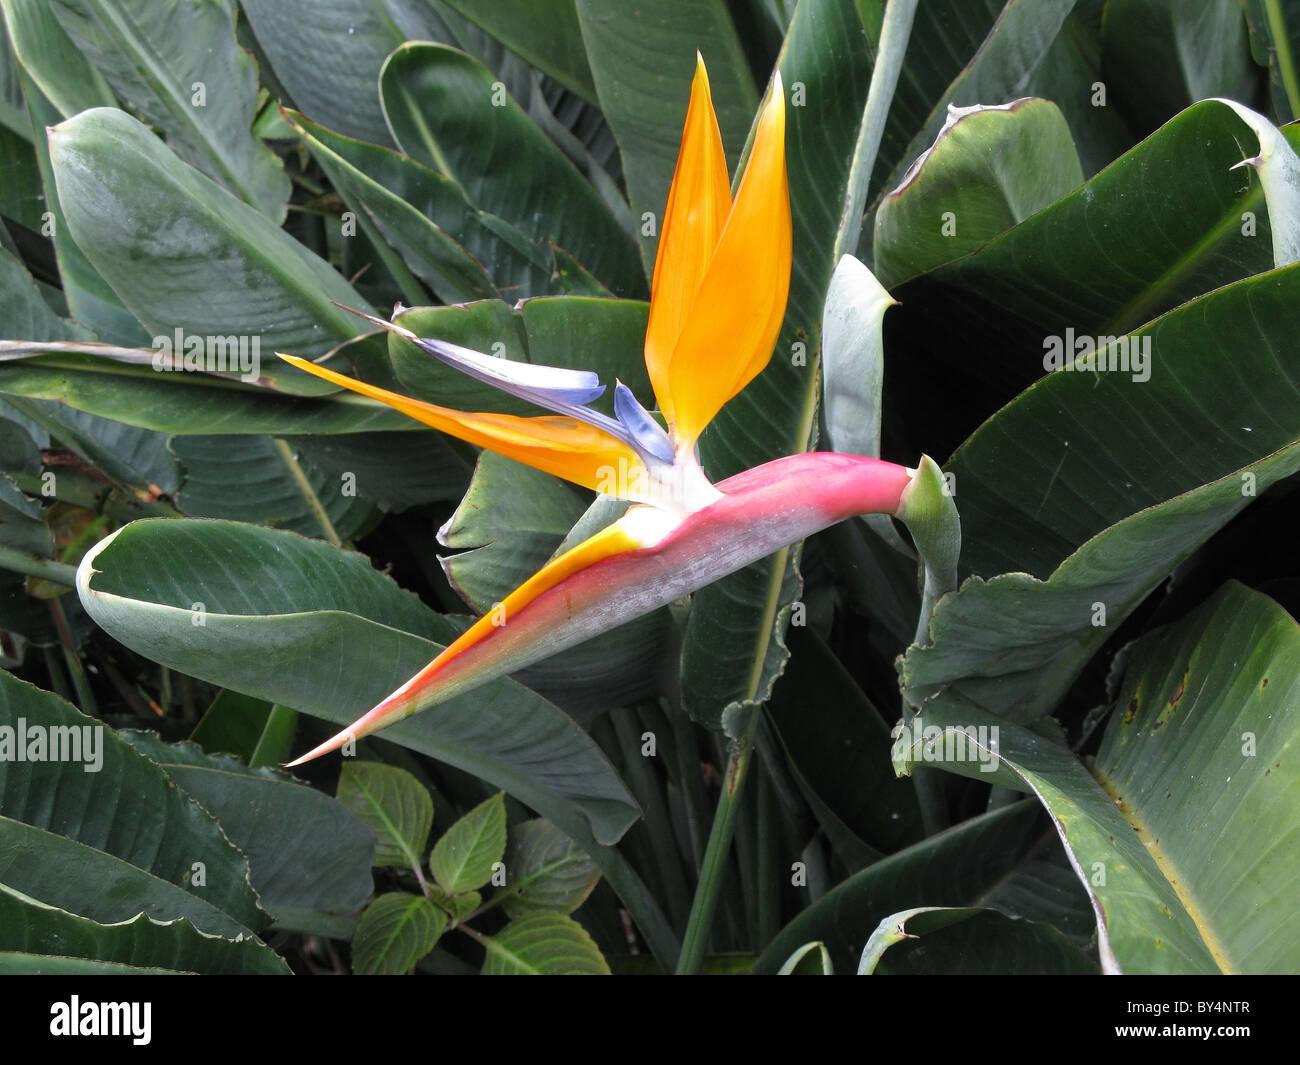 Oiseau De Paradis Fleur Strelitzia Tenerife Islas Canarias